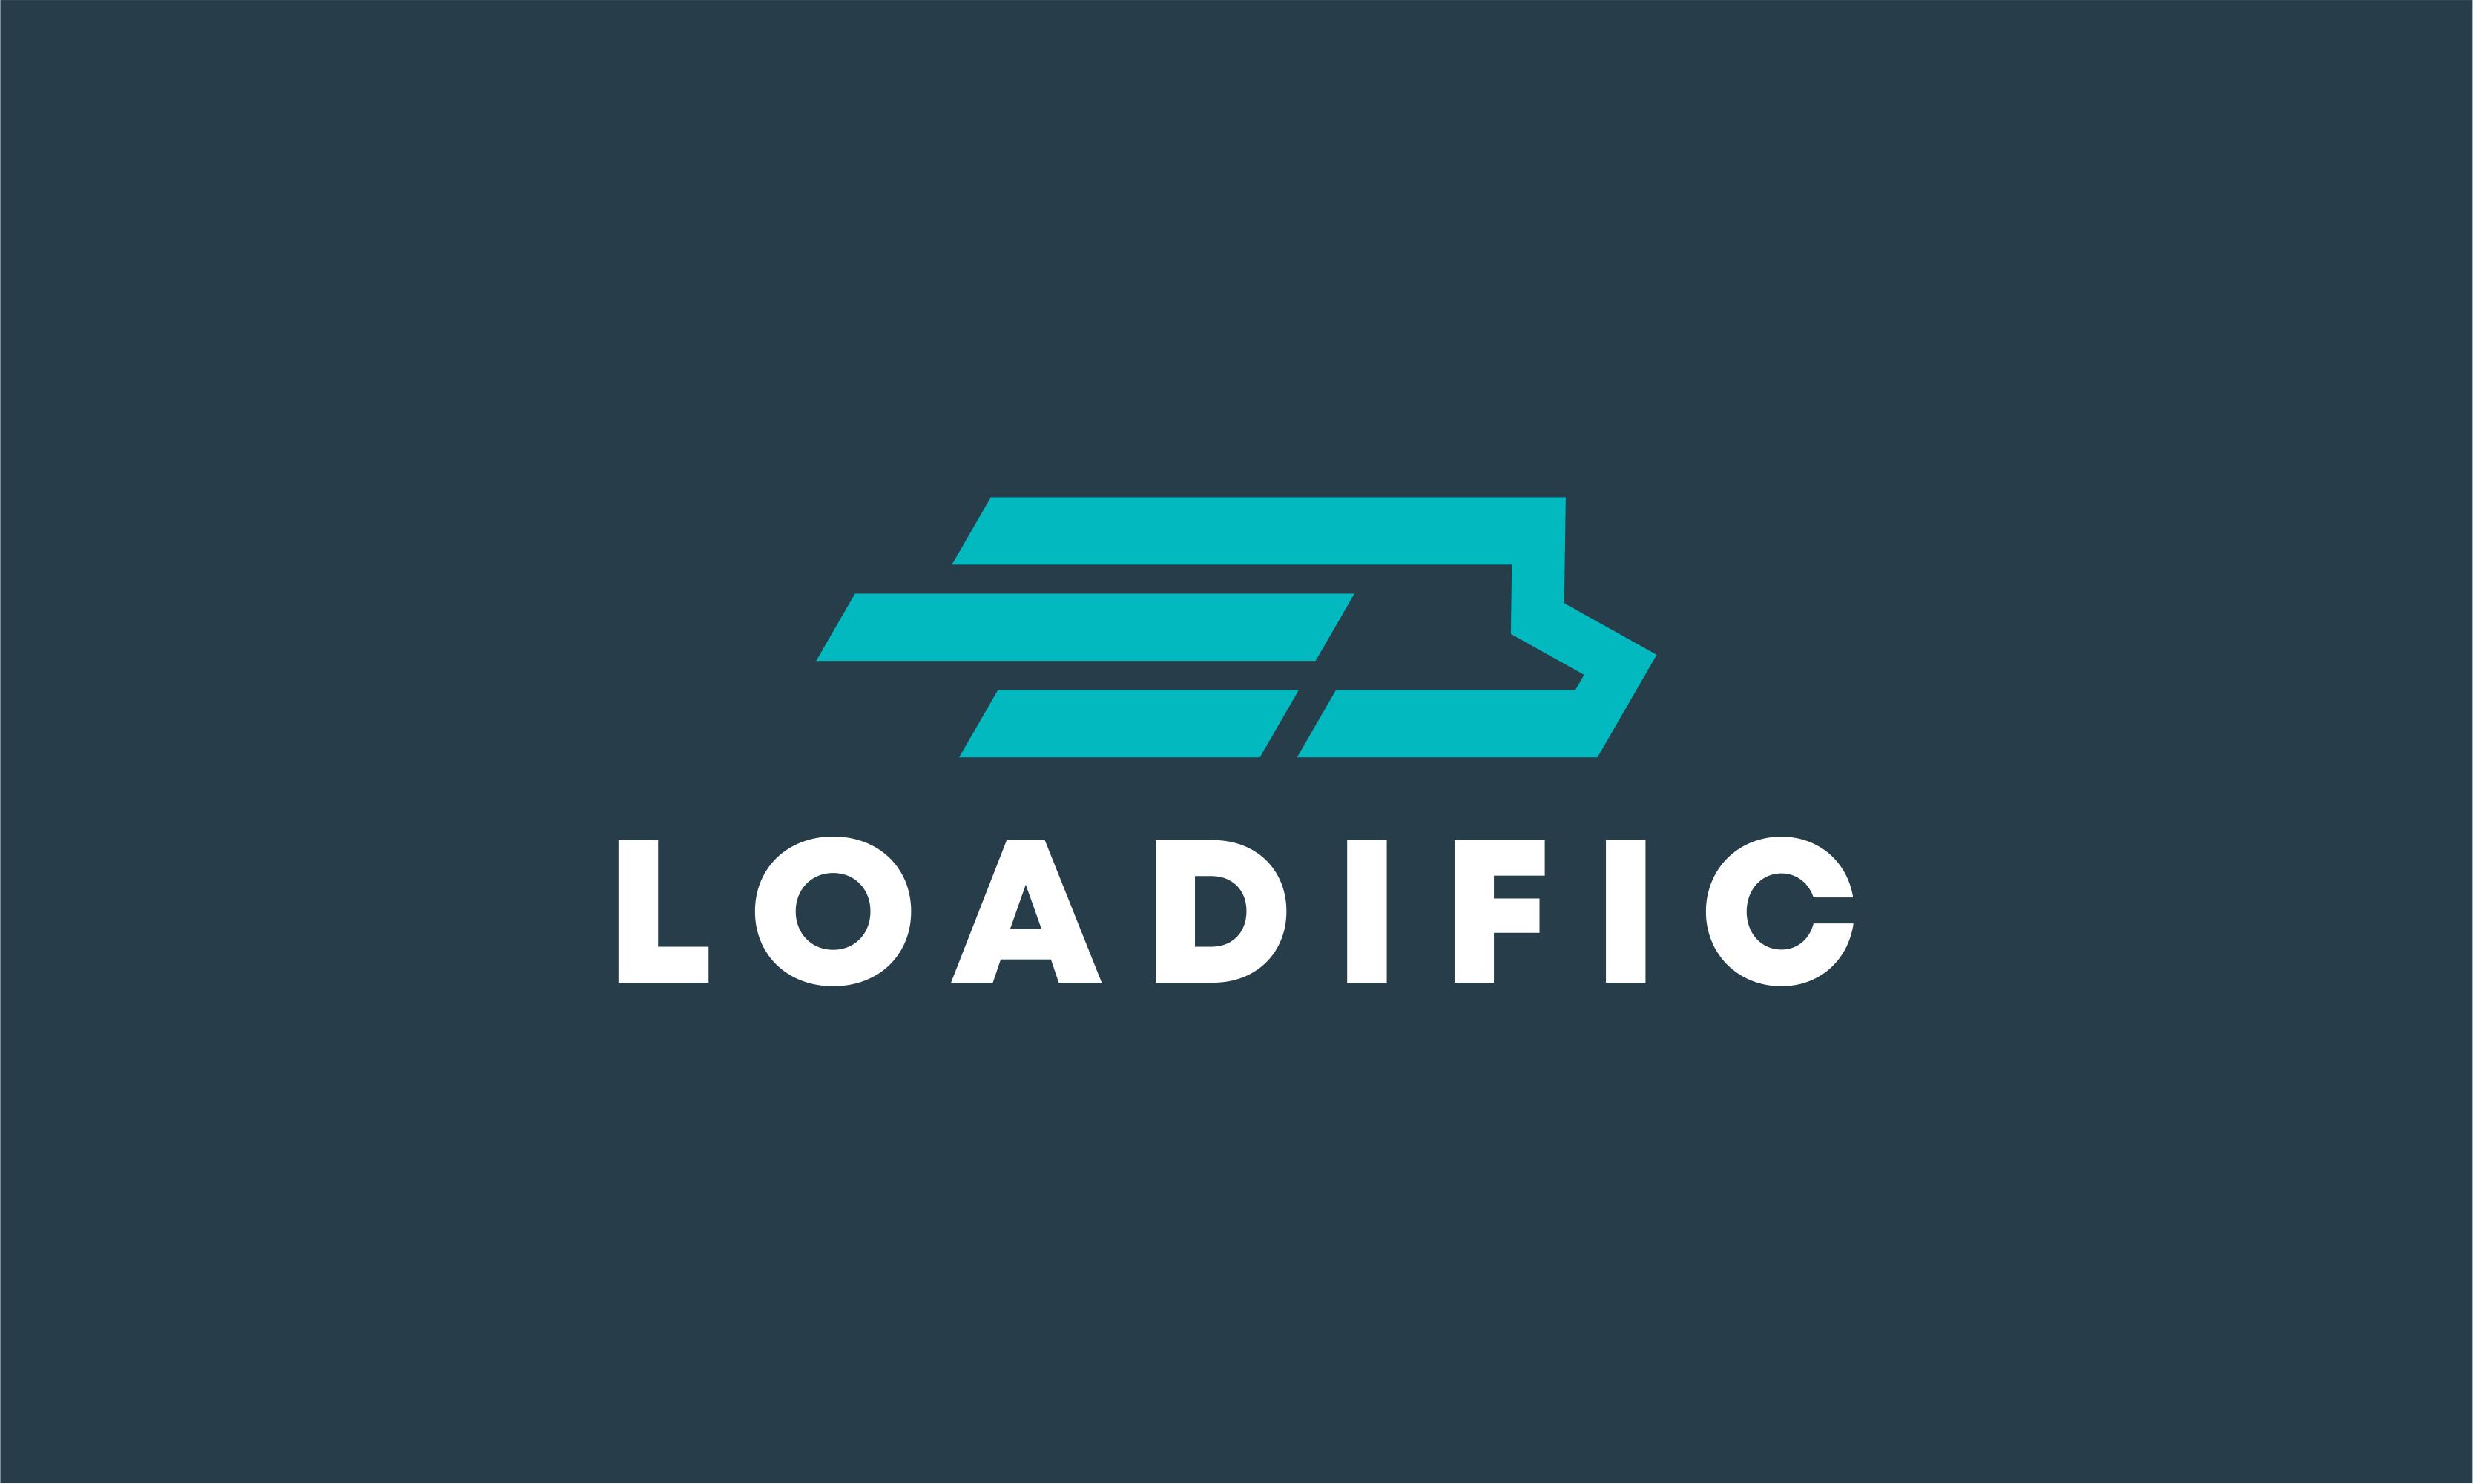 Loadific